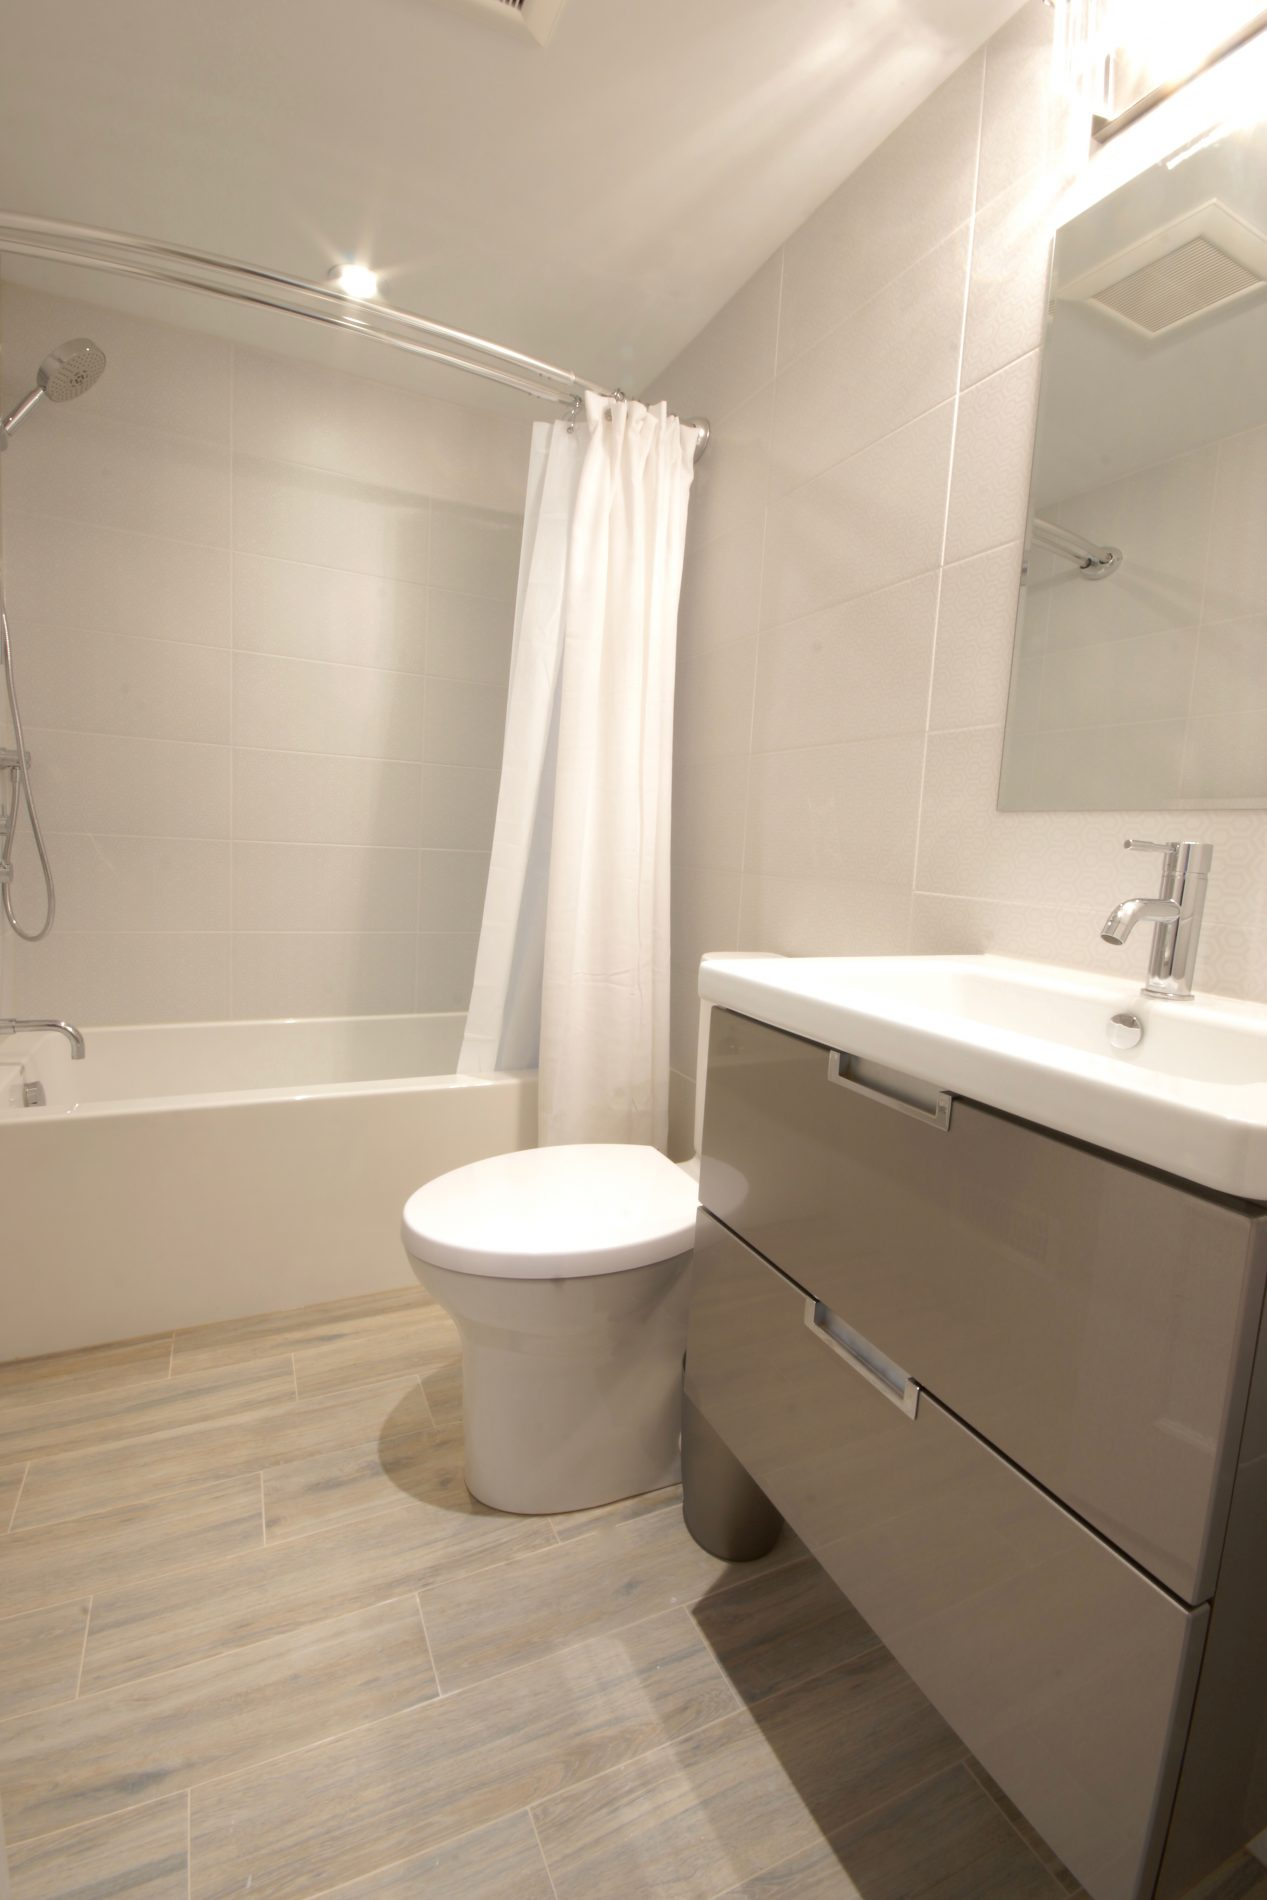 North Heights Rd. – Princess Gardens Toronto Bath Renovation - Featured Image